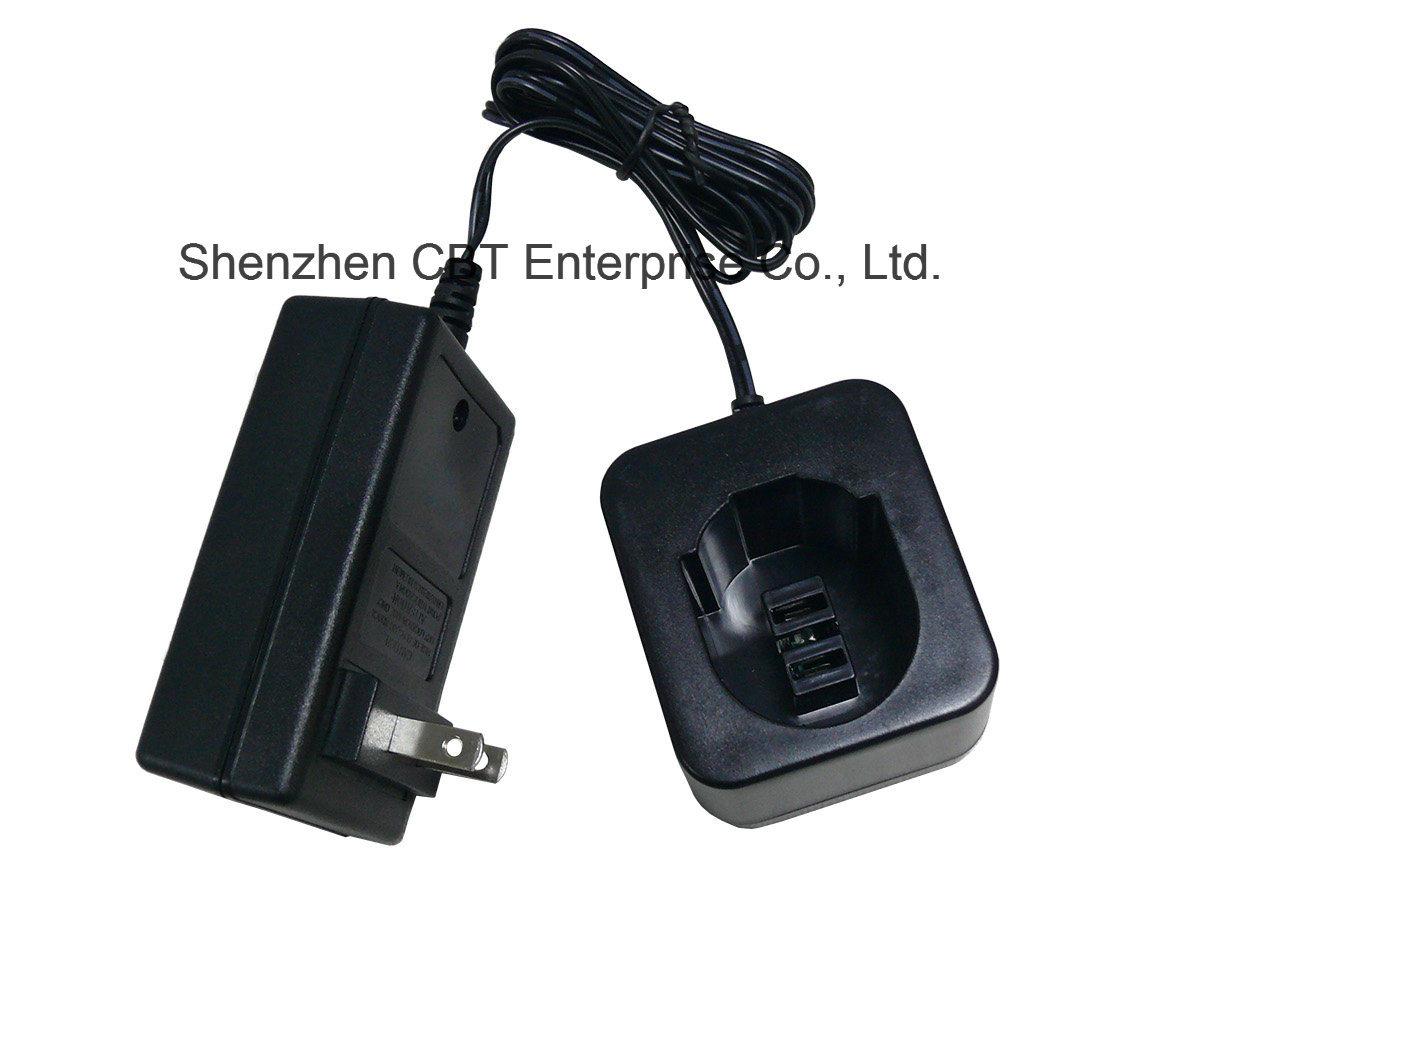 Power Tool Battery Charger for Dewalt Ni-MH, Ni-CD